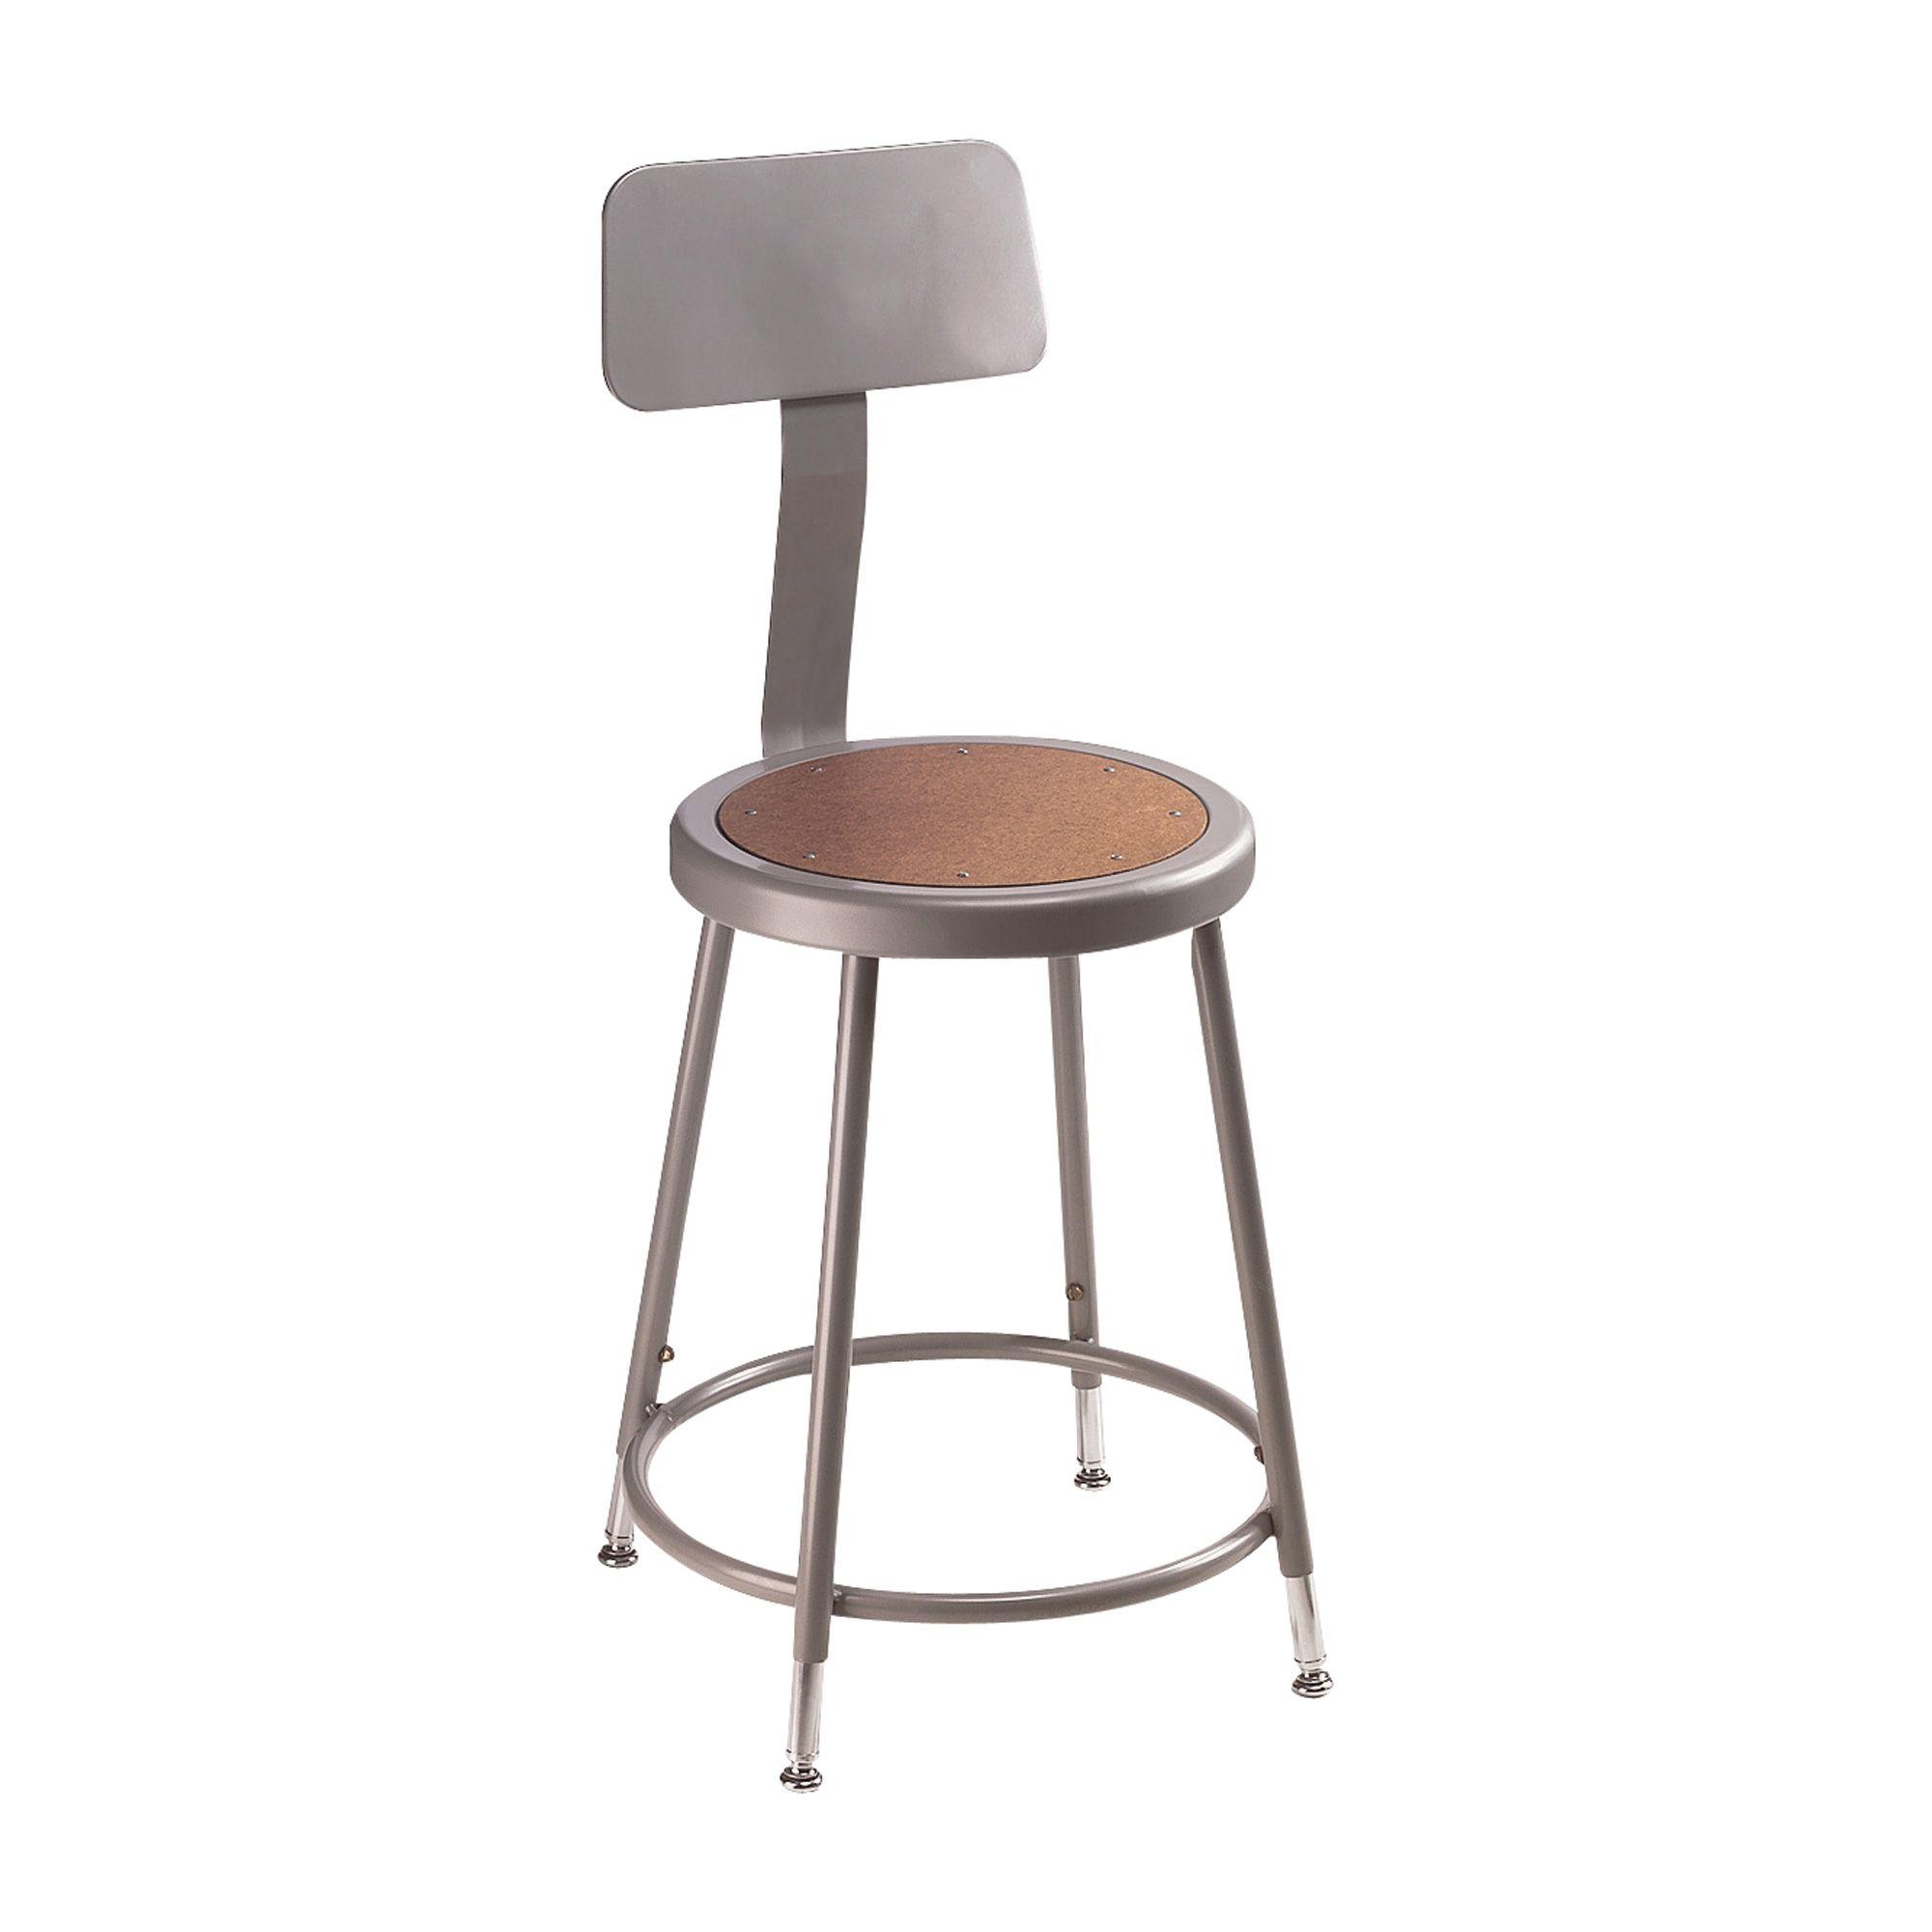 Prime National Public Seating Adjustable Shop Stool With Back Ibusinesslaw Wood Chair Design Ideas Ibusinesslaworg